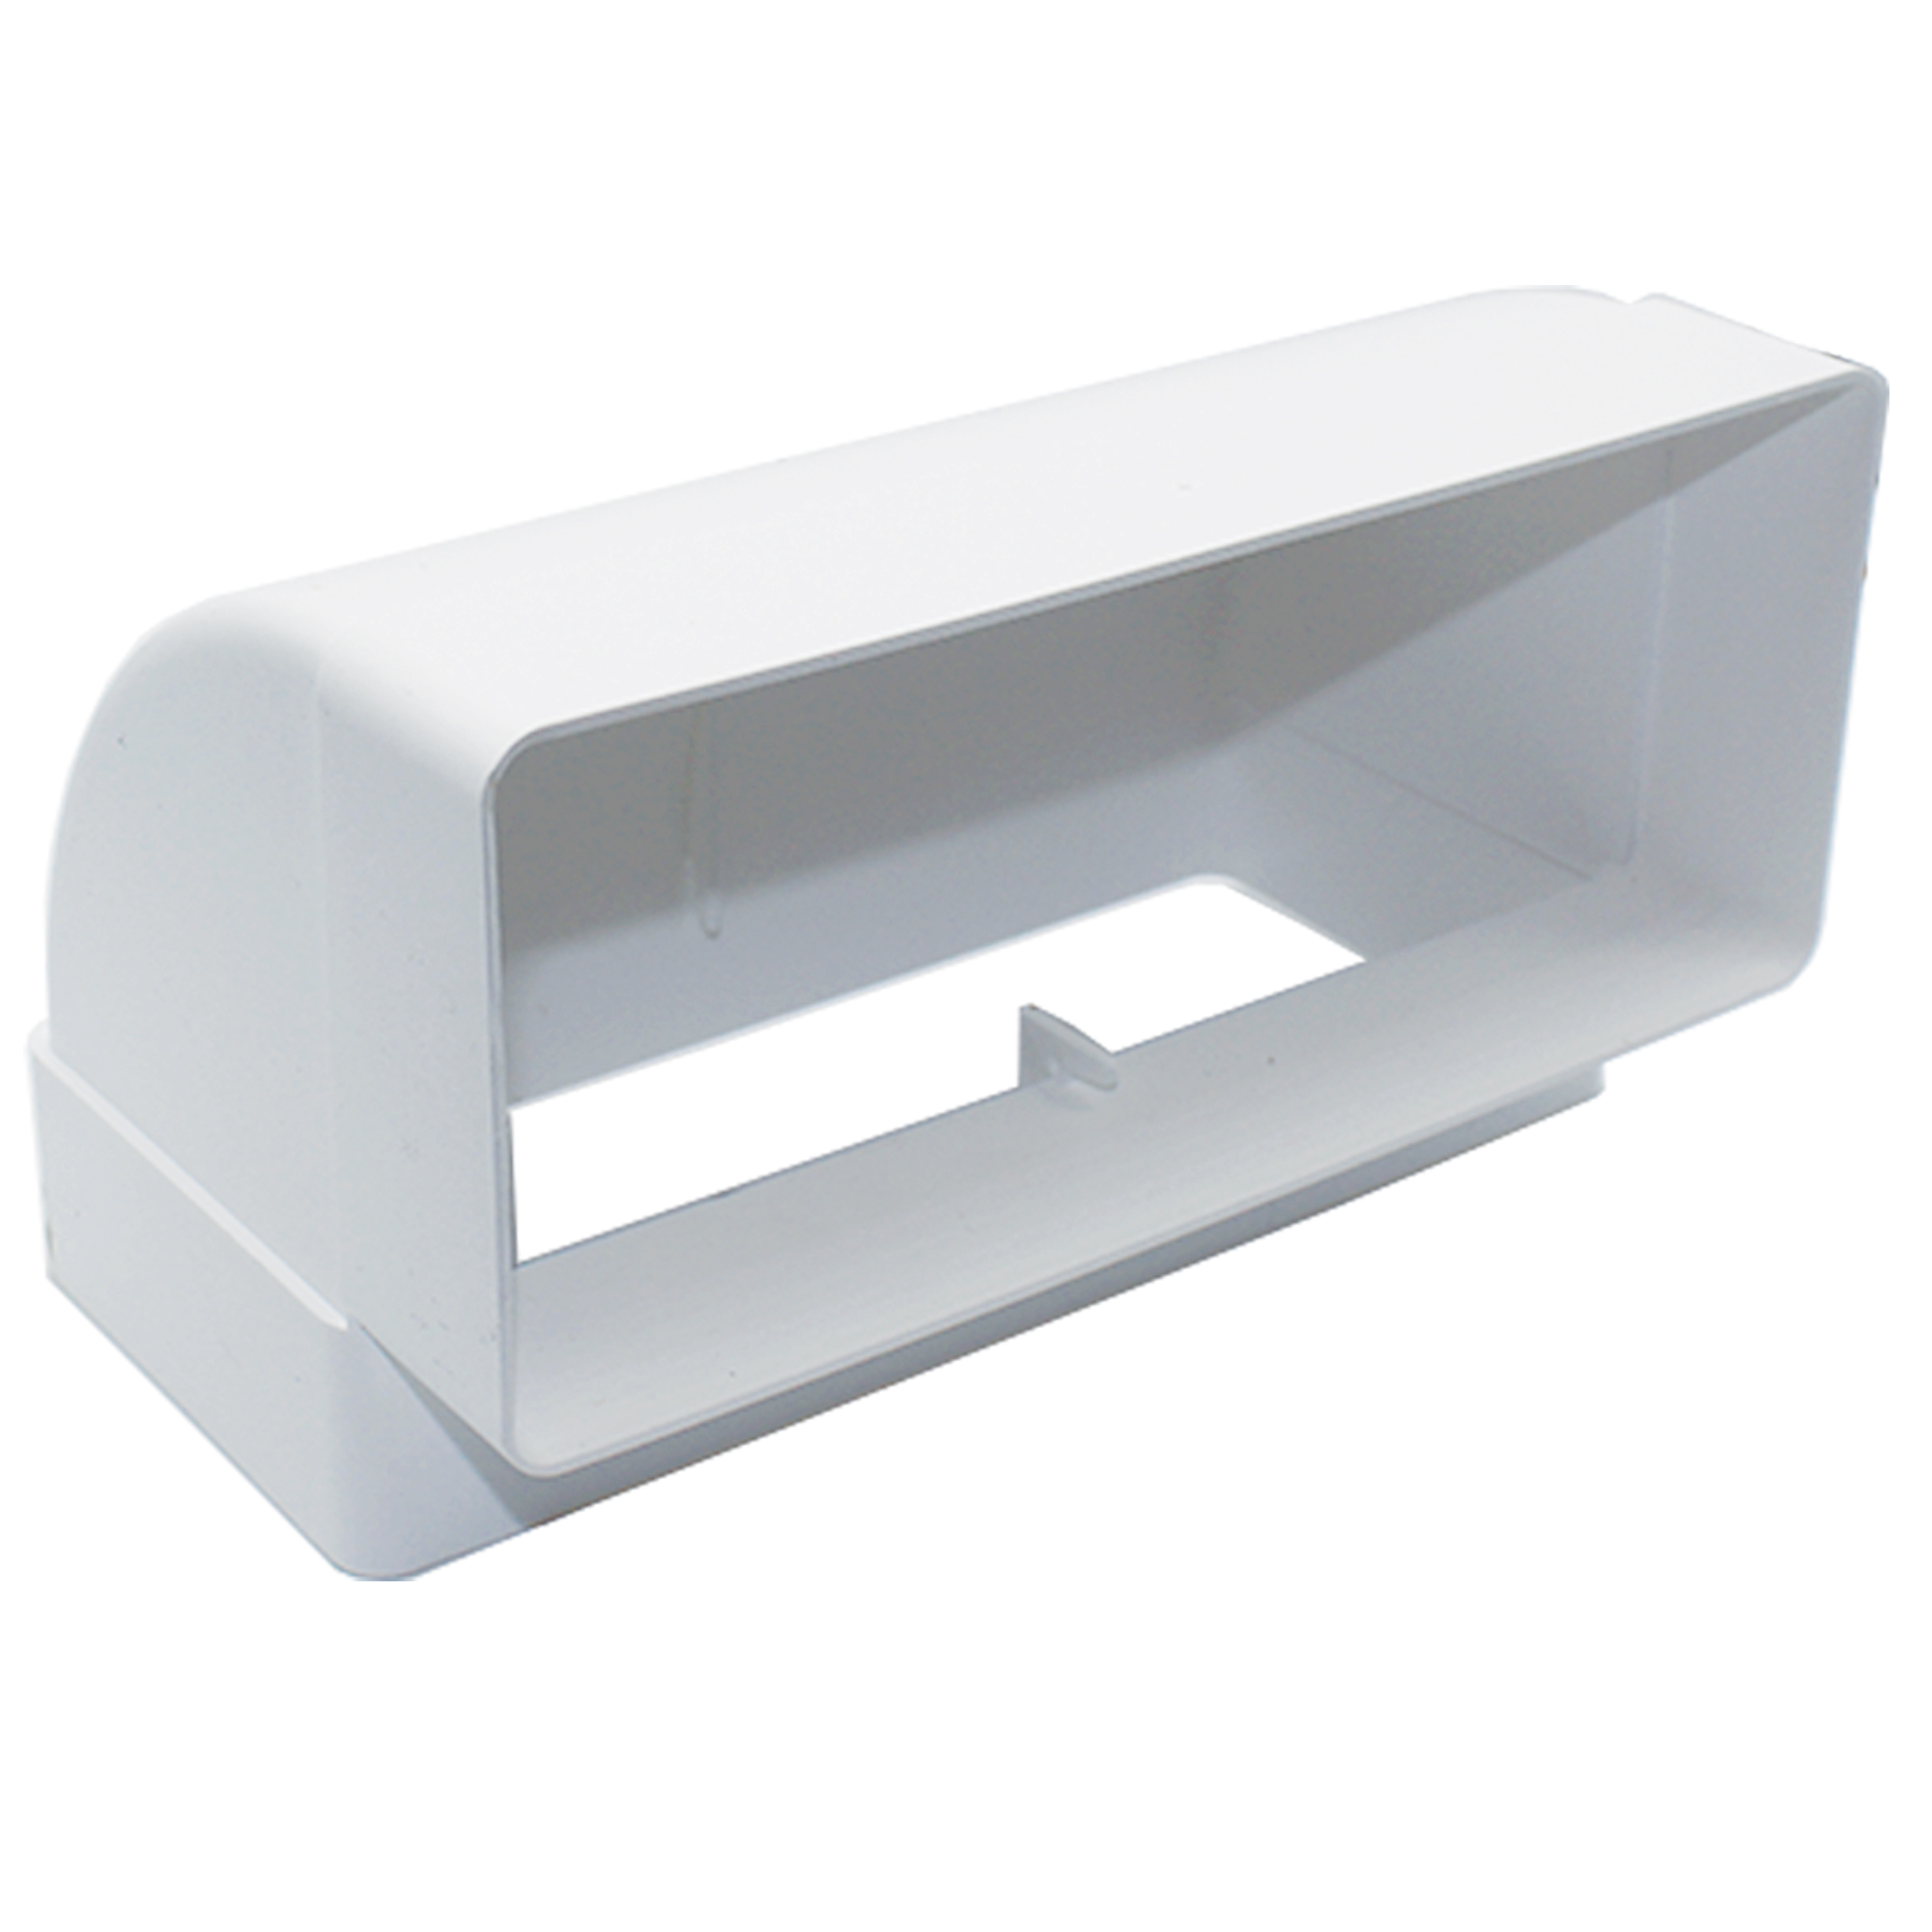 AA-DUCT012 220mm x 90mm rectangular 90 Degree Vertical Elbow Bend